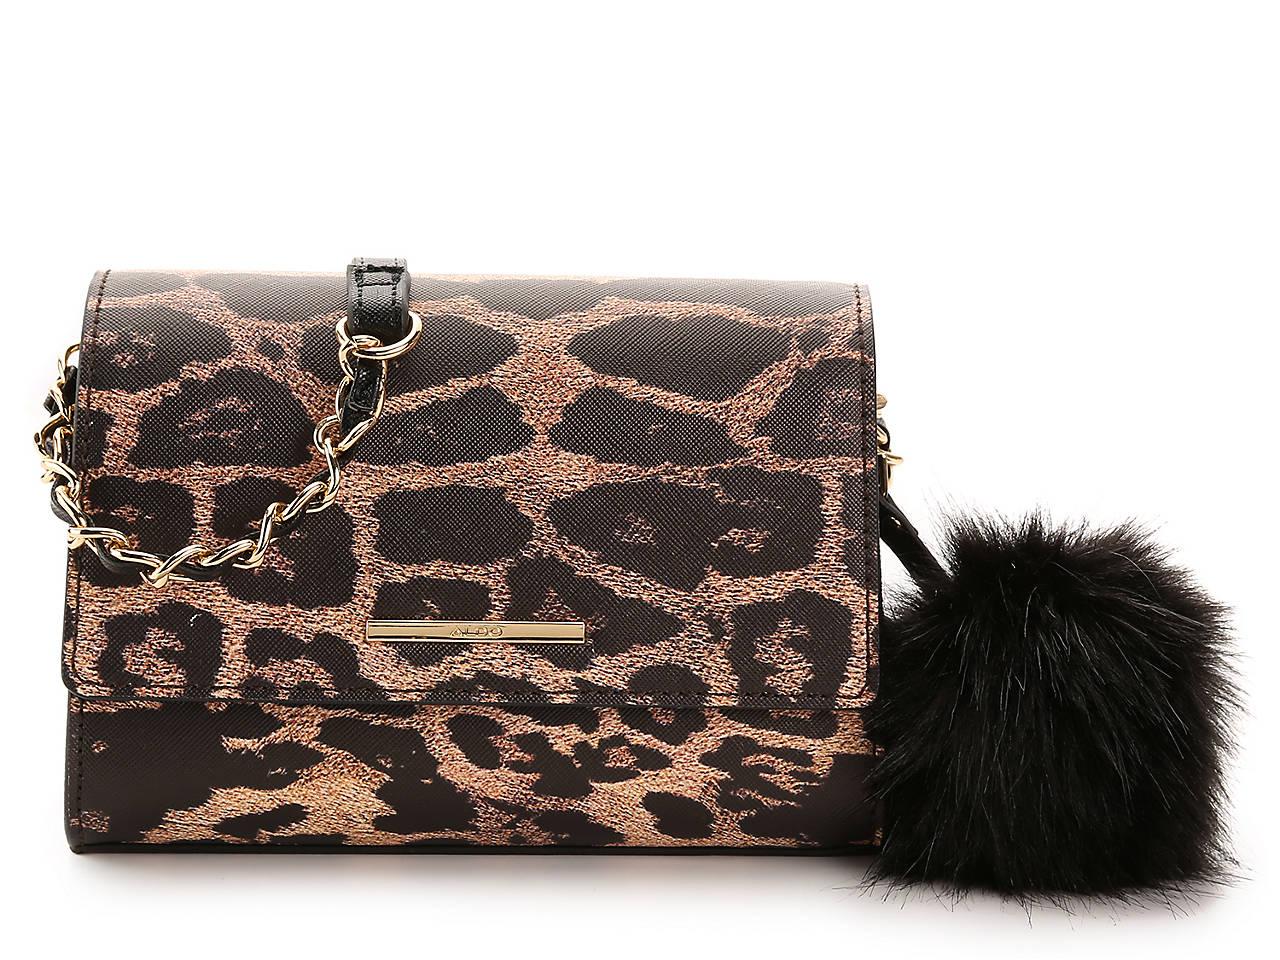 5235dd44797 Aldo Astoewiel Crossbody Bag Women's Handbags & Accessories | DSW